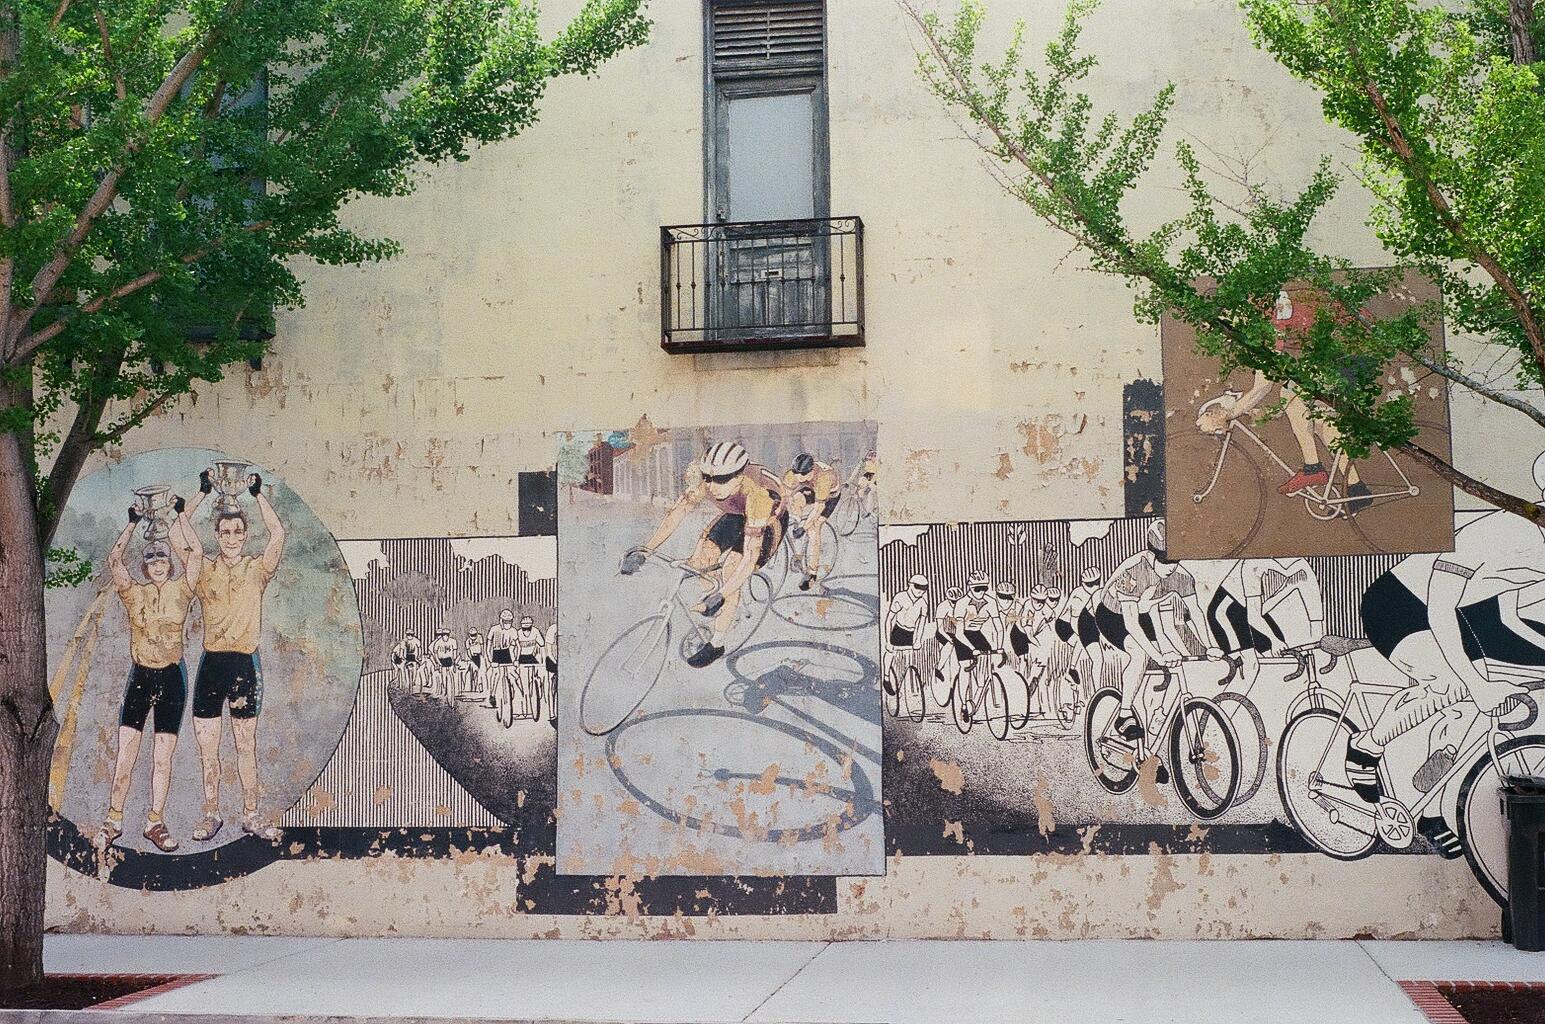 Bike Mural in Downtown Augusta Georgia